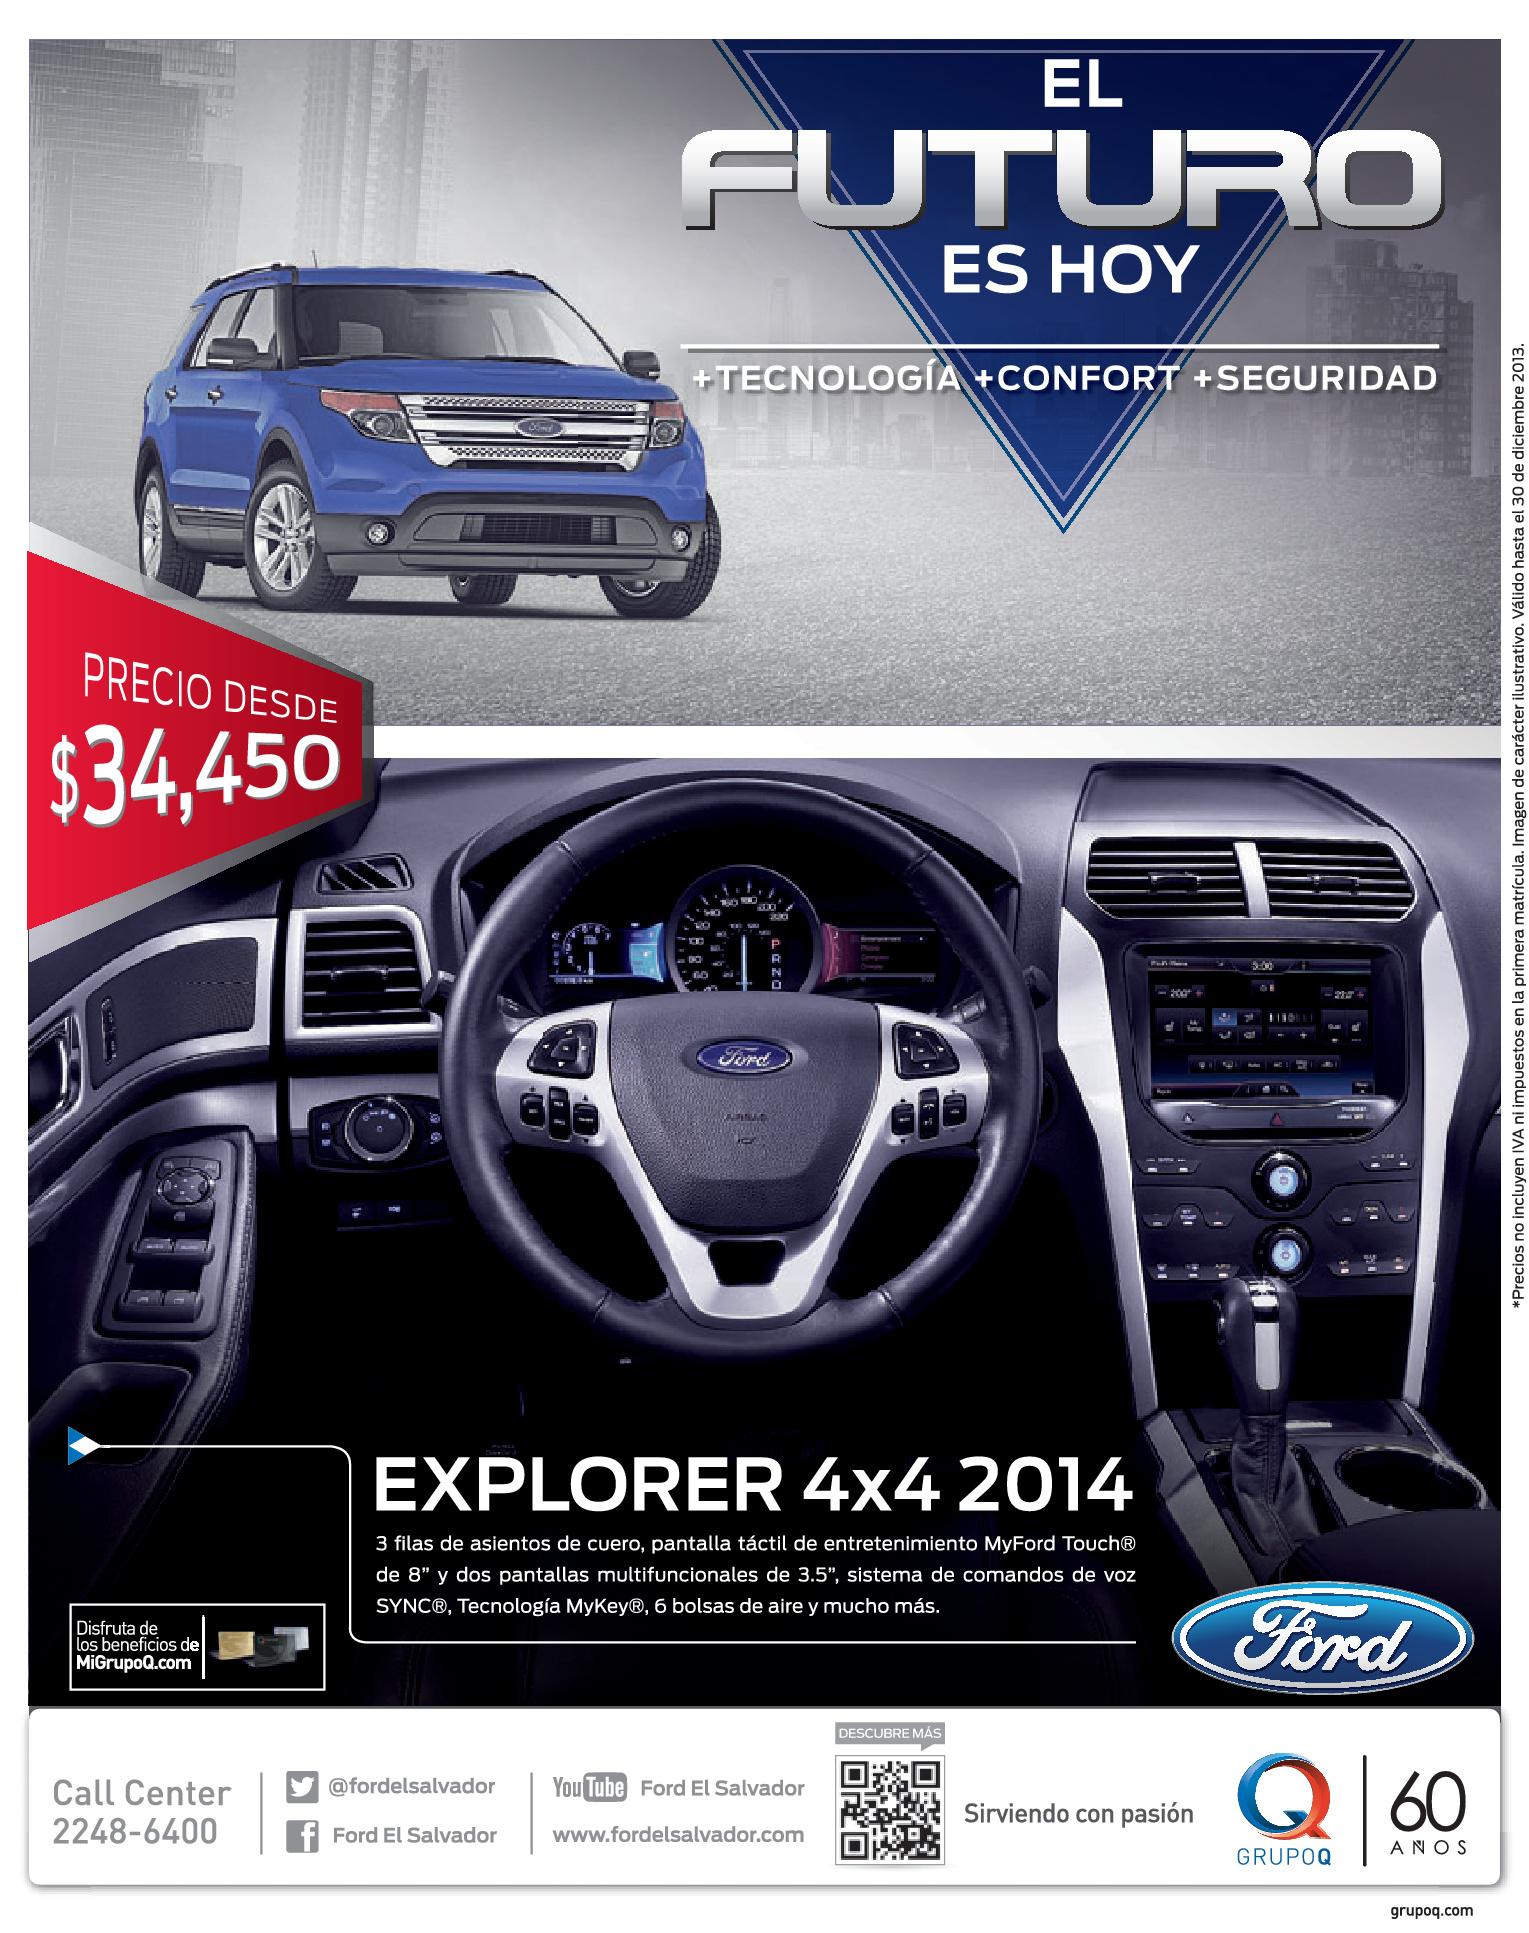 Ford explorer 4x4 2014 promotion grupo q 11dic13 for Ford s fish shack menu